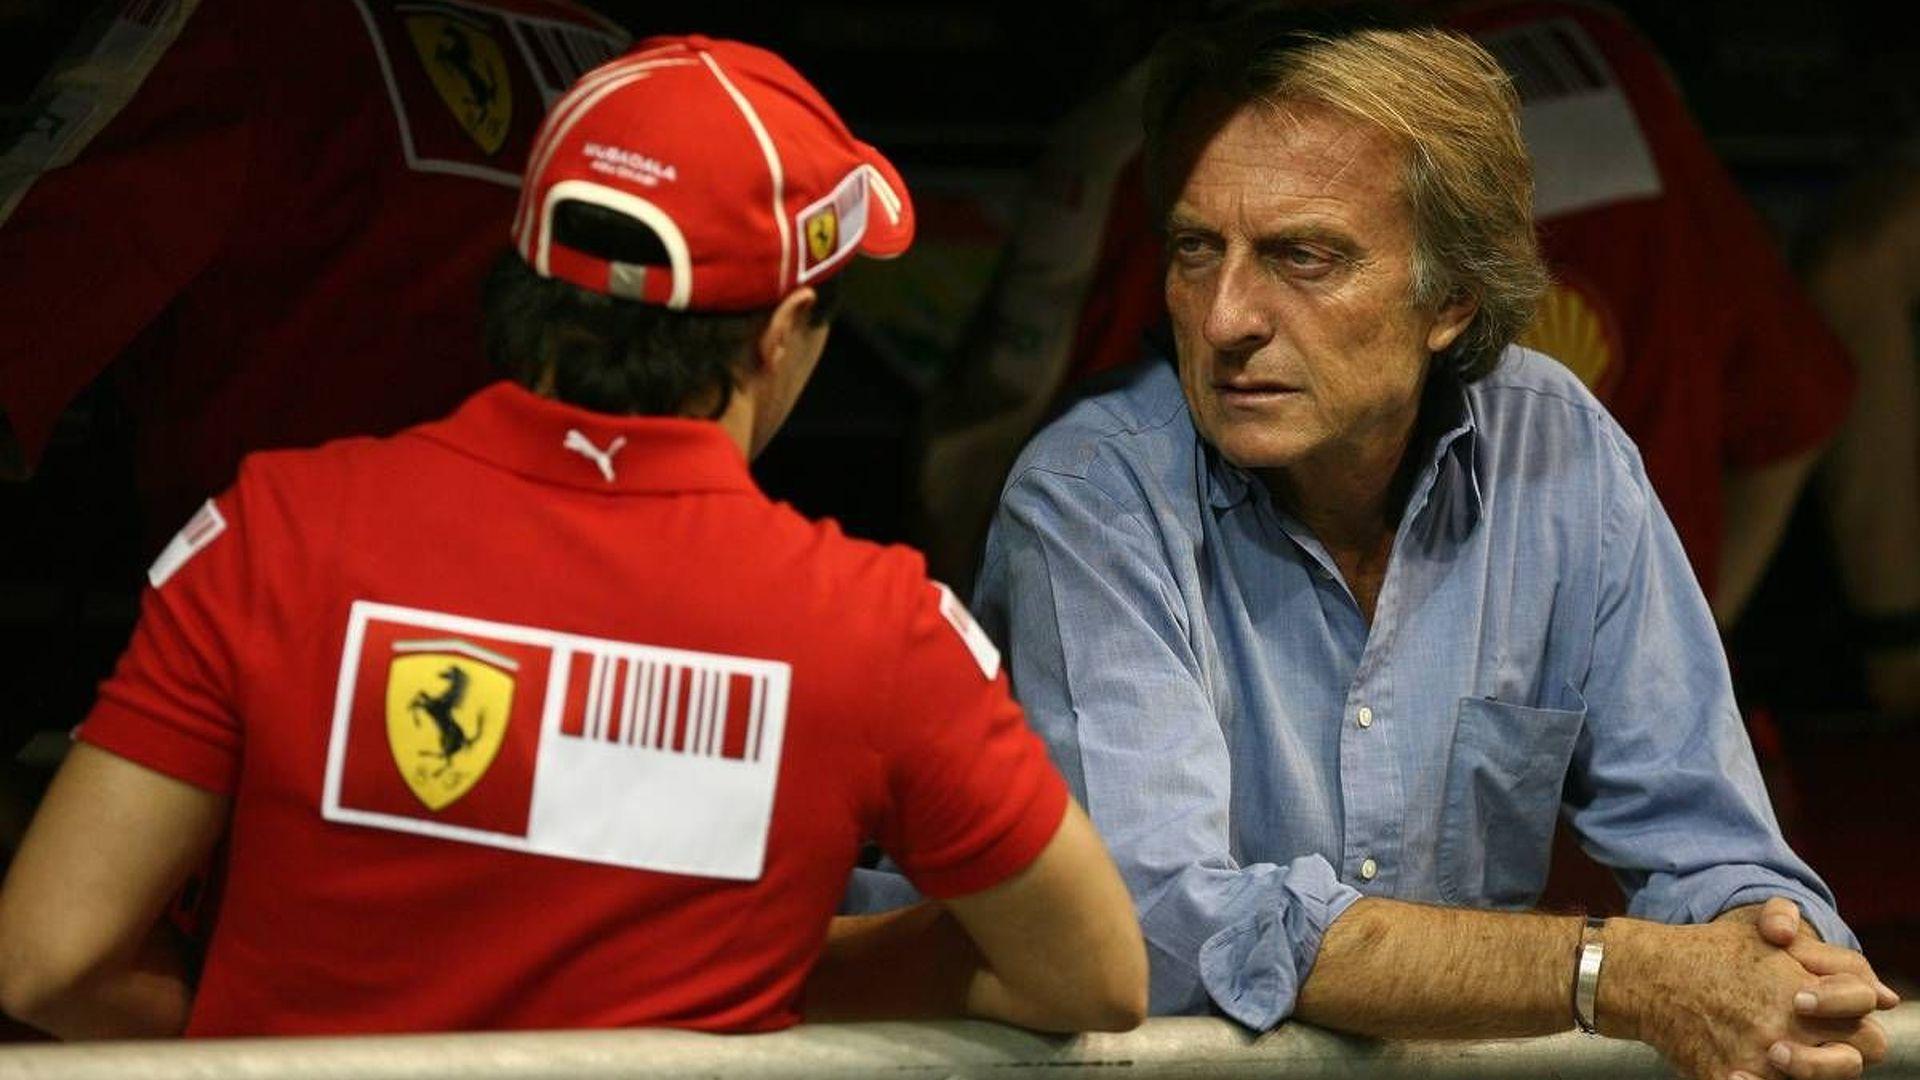 Montezemolo not willing to discuss Massa's contract